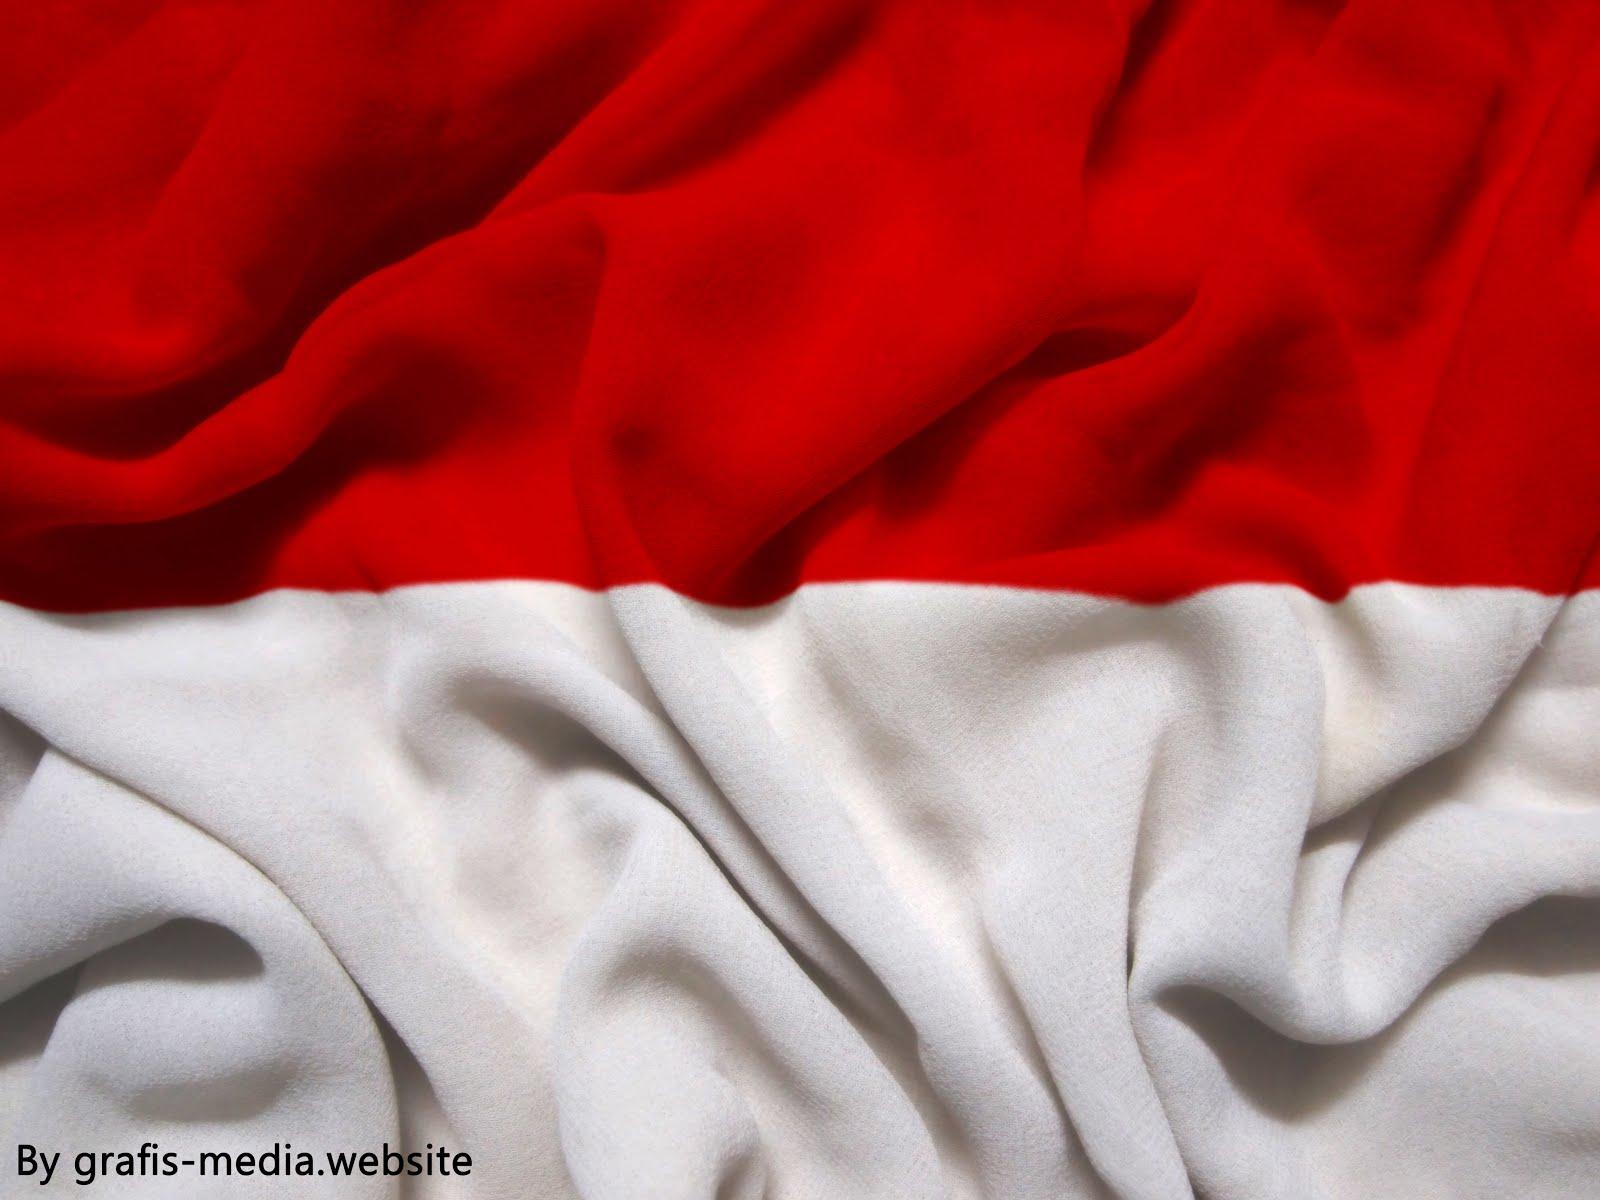 bendera merah putih cdr bendera merah putih cdr